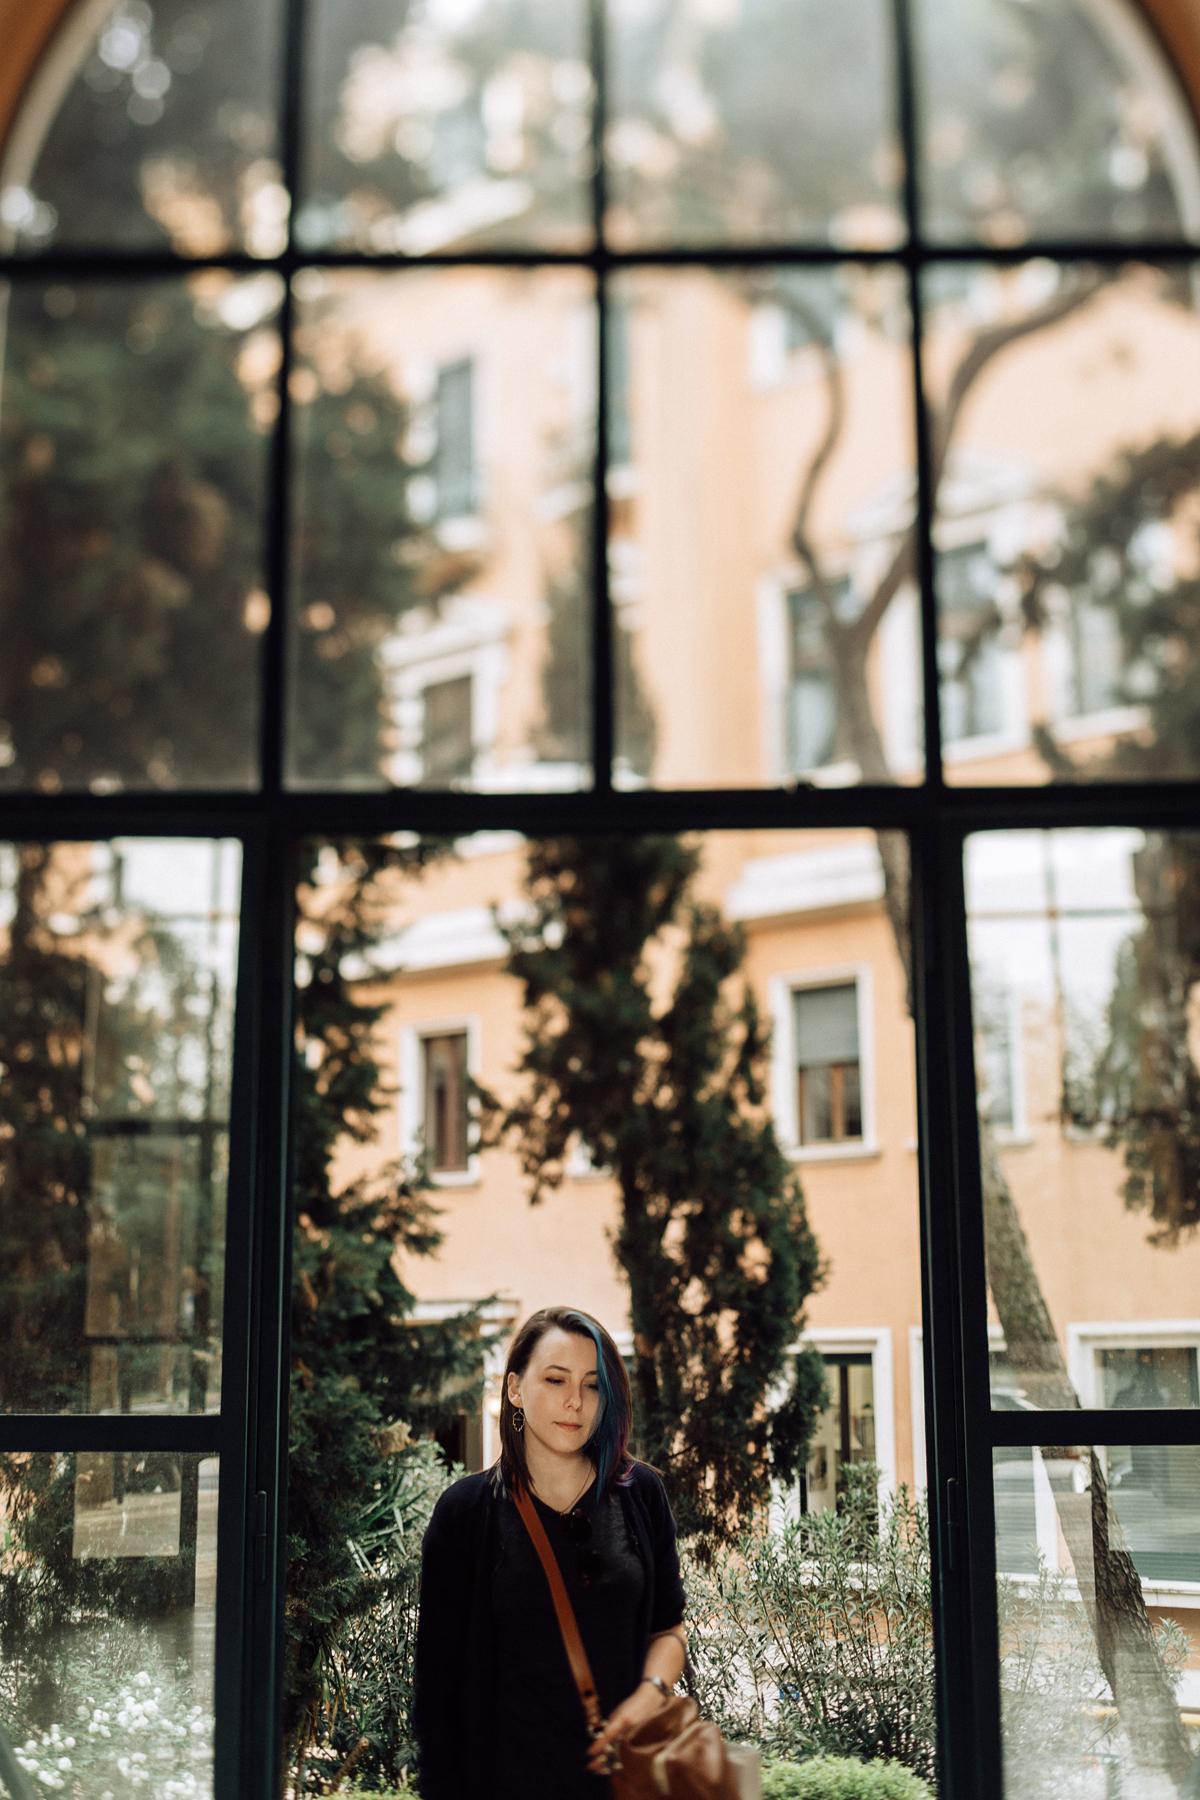 401-Petersone-Liene-Rome-blog